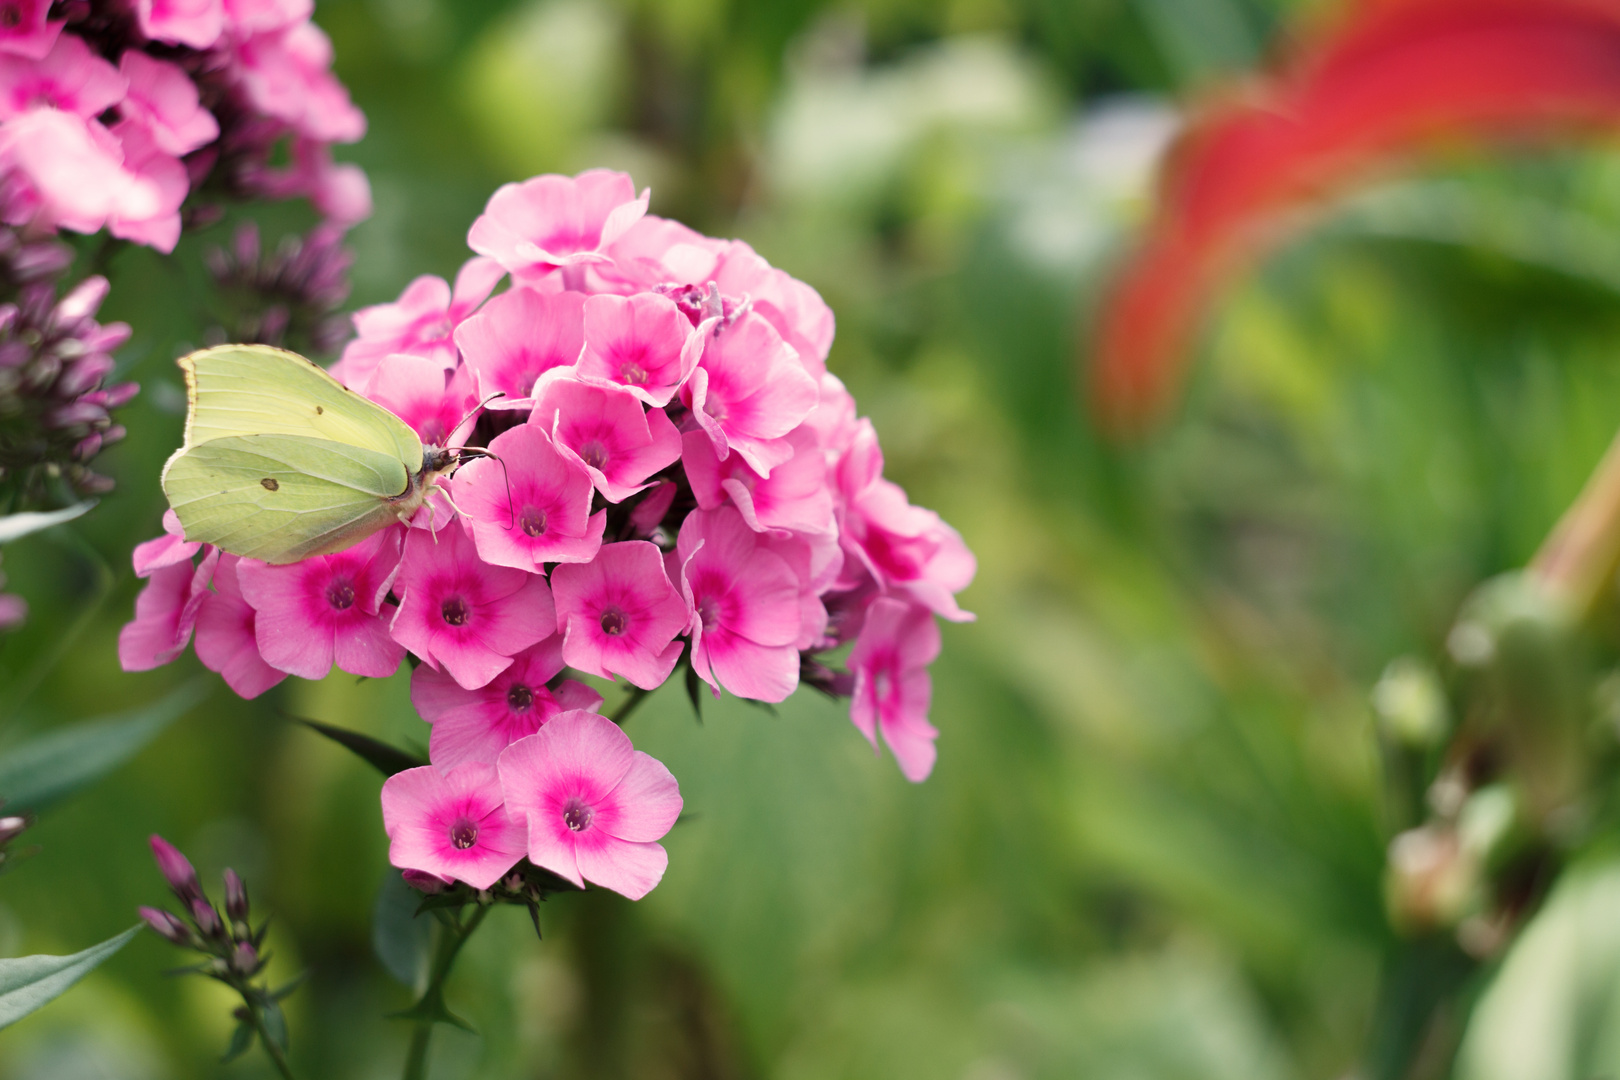 Bokehlicious - Schmetterling